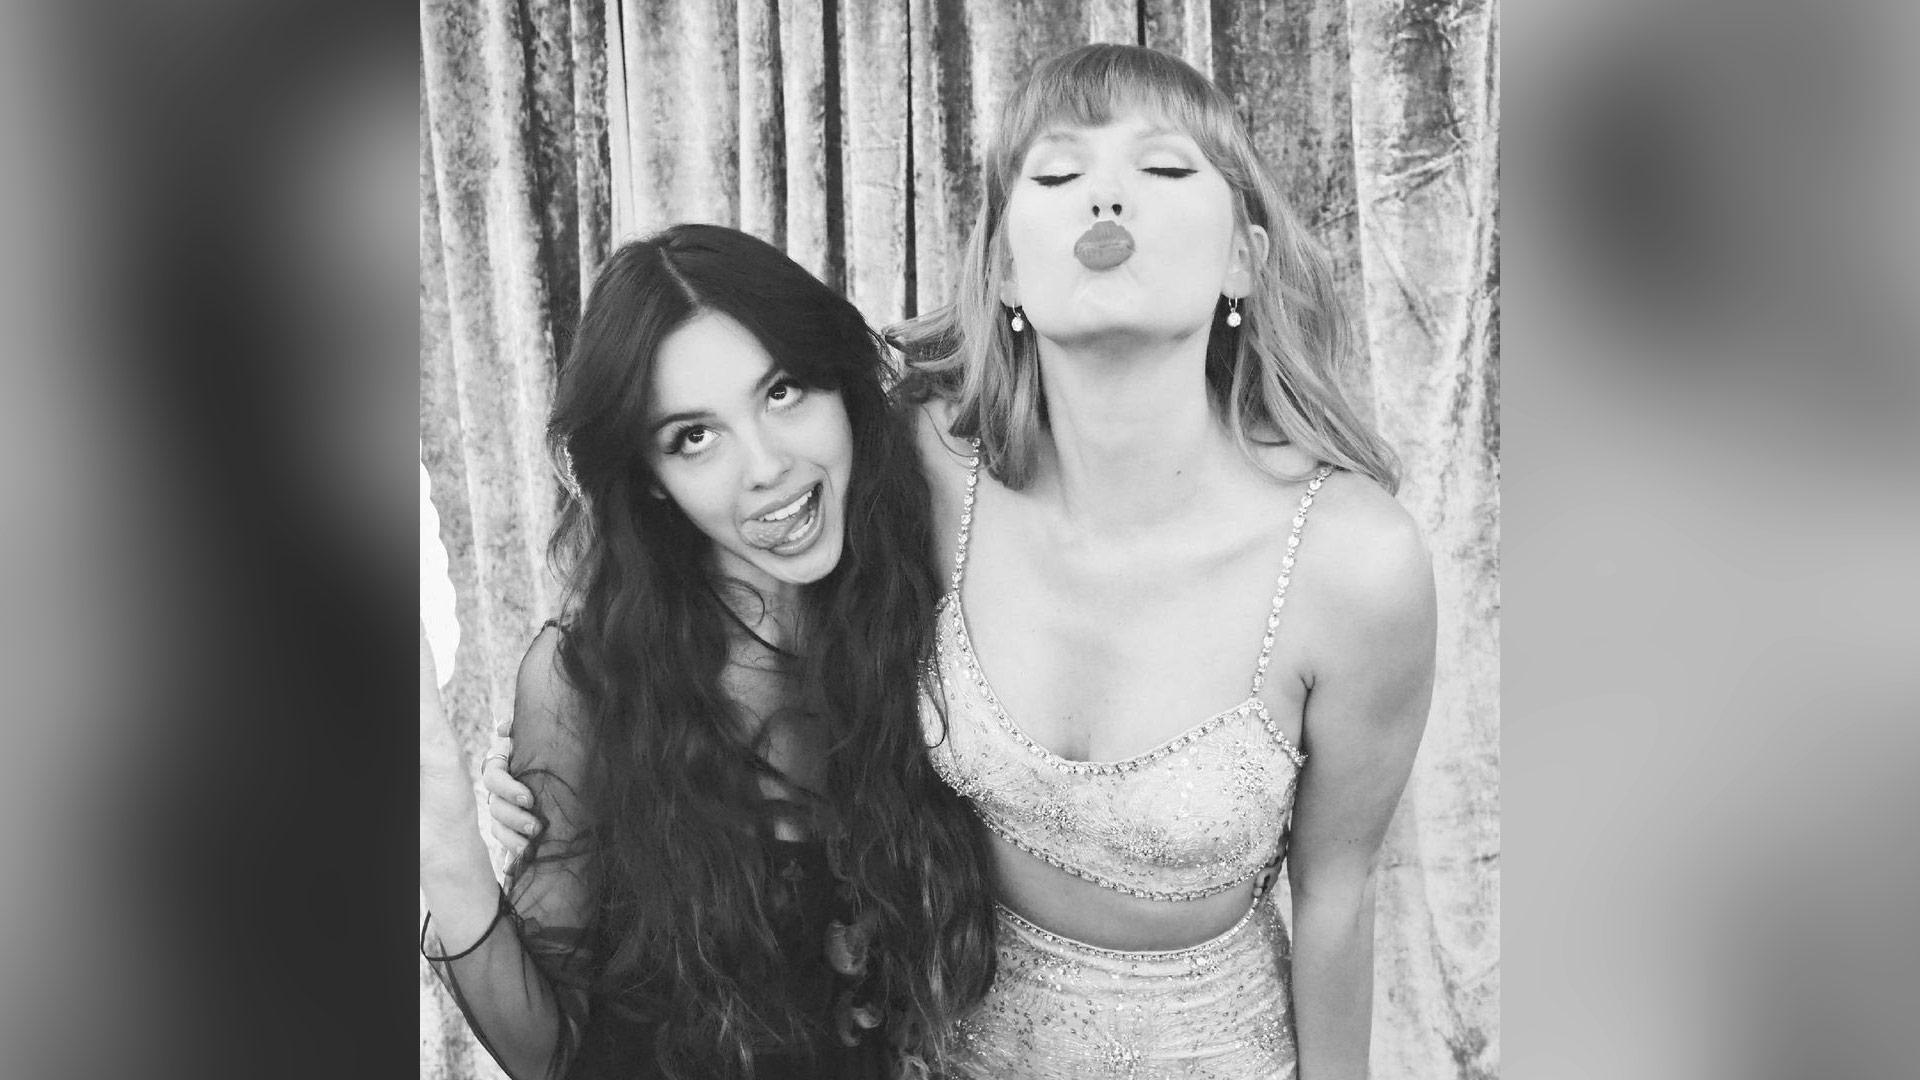 Taylor Swift and Olivia Rodrigo met at the BRIT Awards